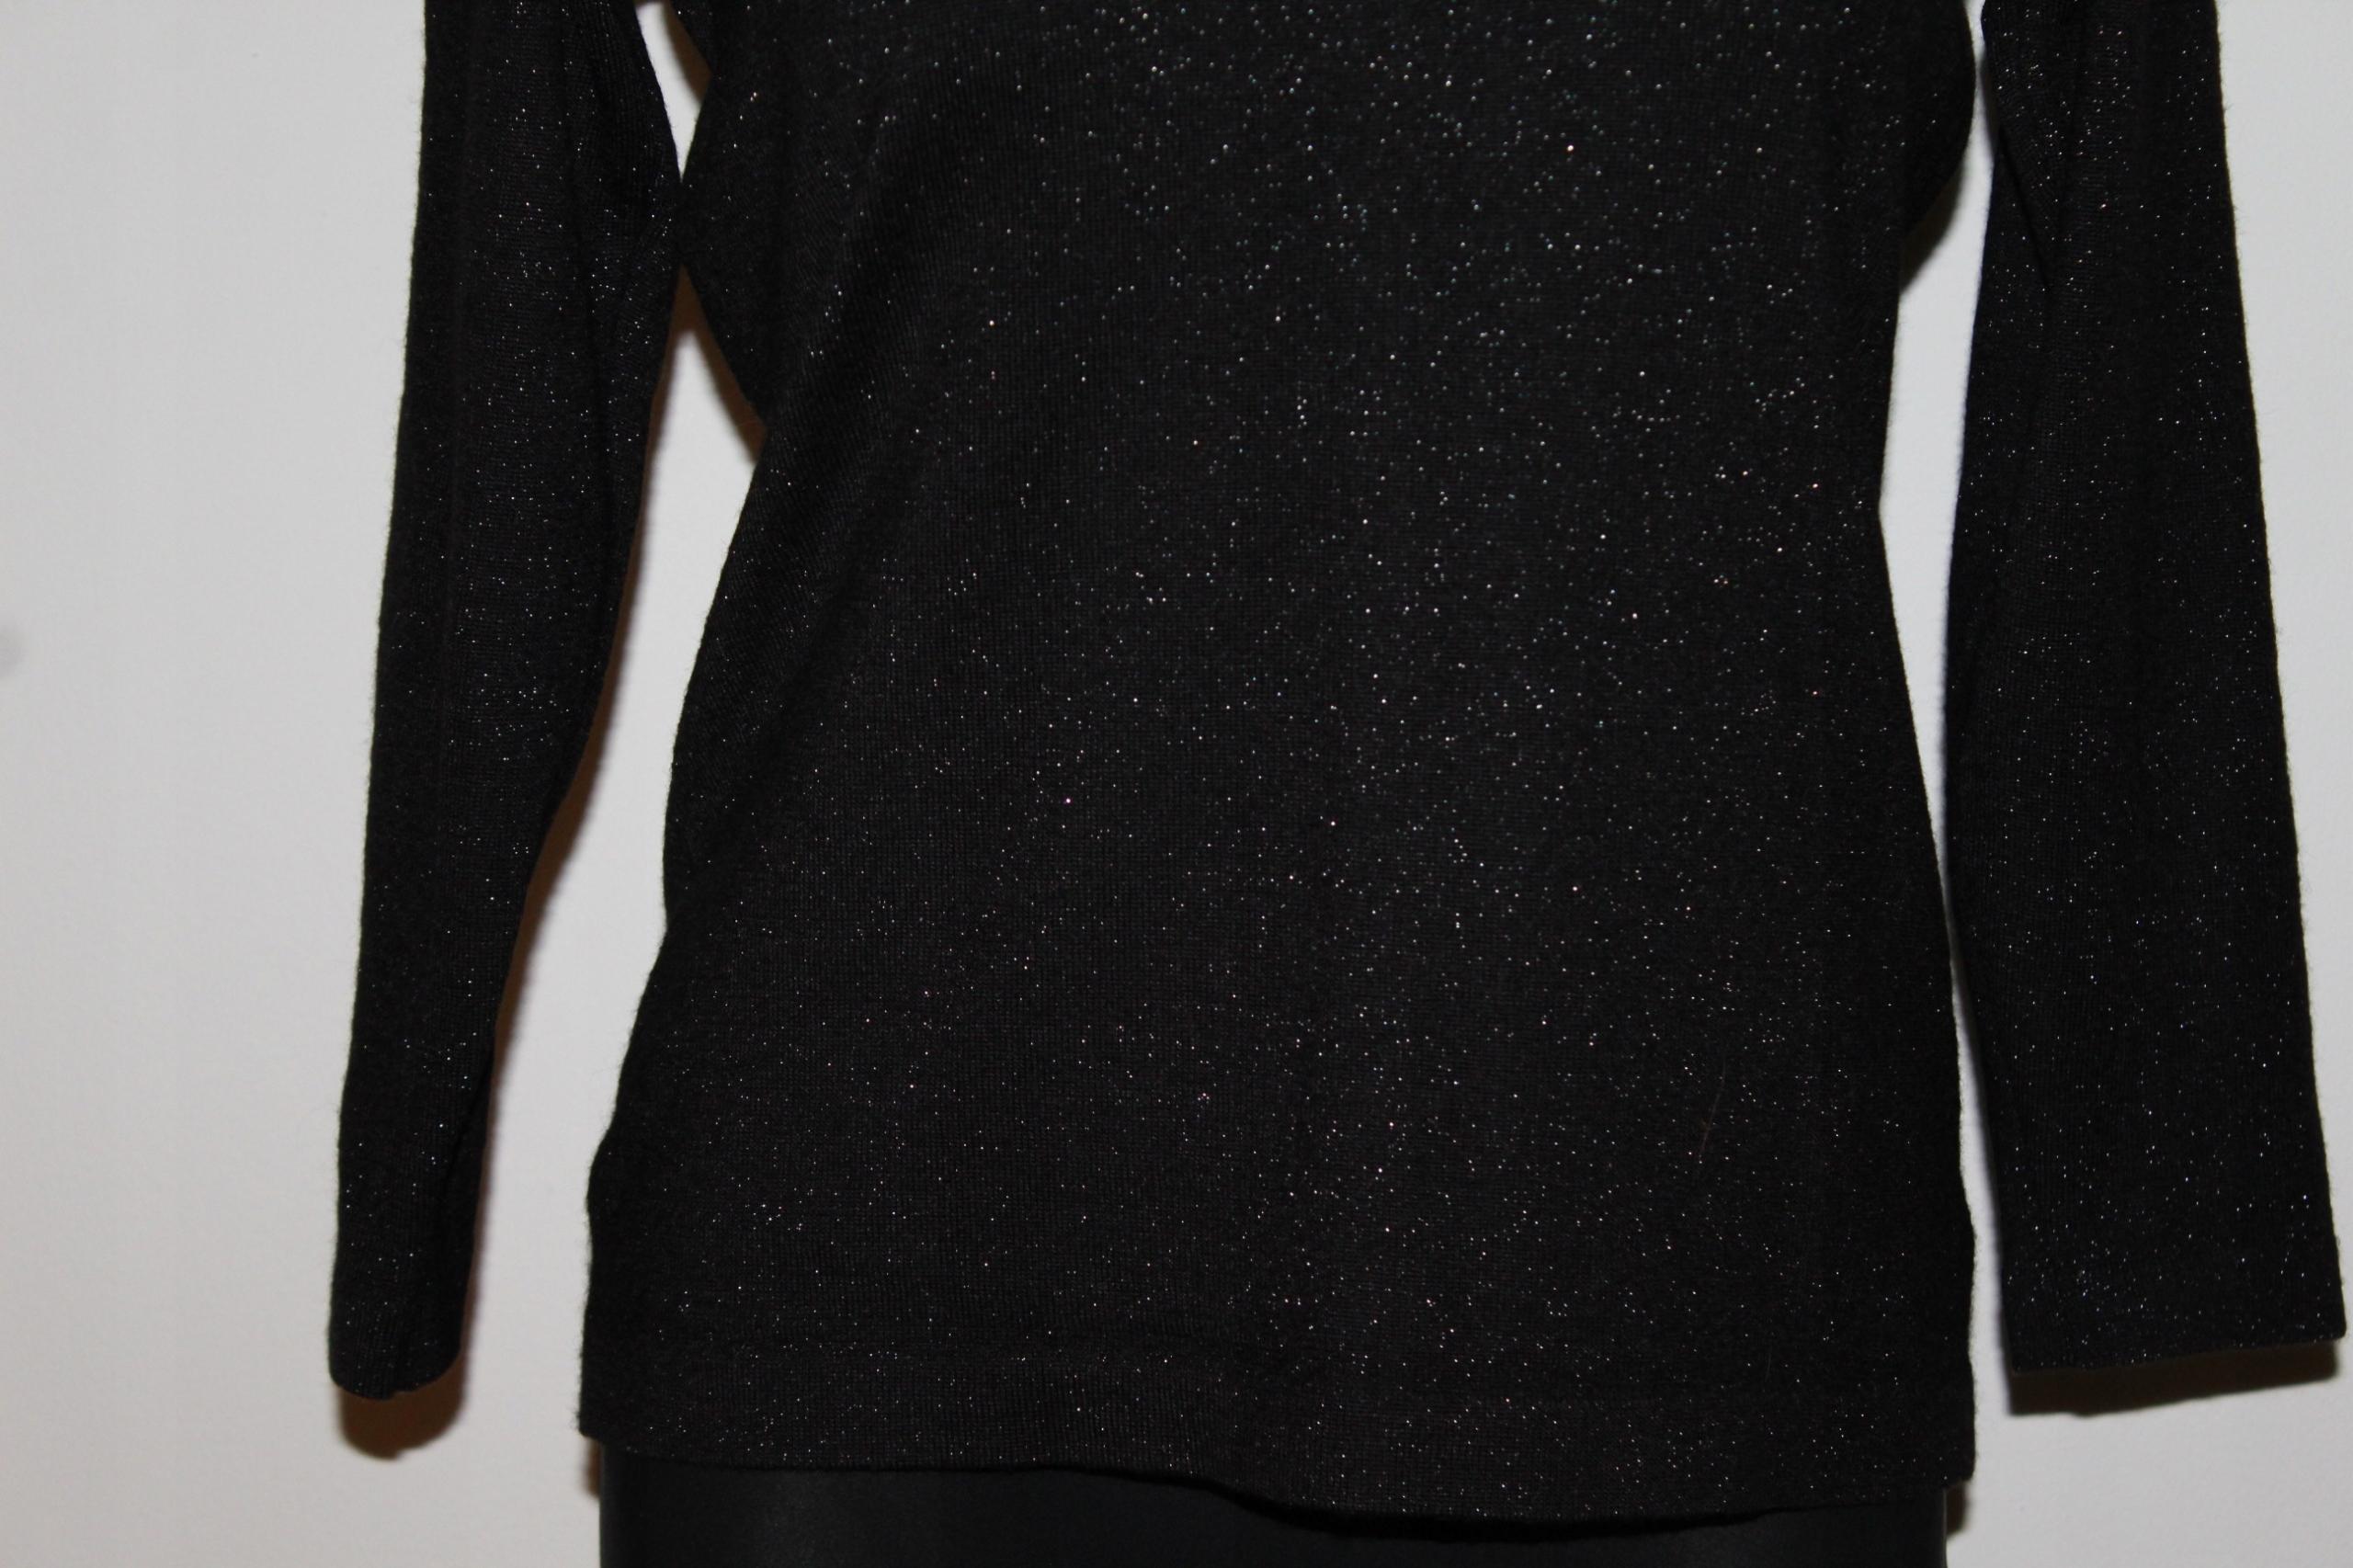 3b146c6d19ca55 czarny srebrna nitka sweter MARCEL CLAIR L/XL - 7465741164 ...